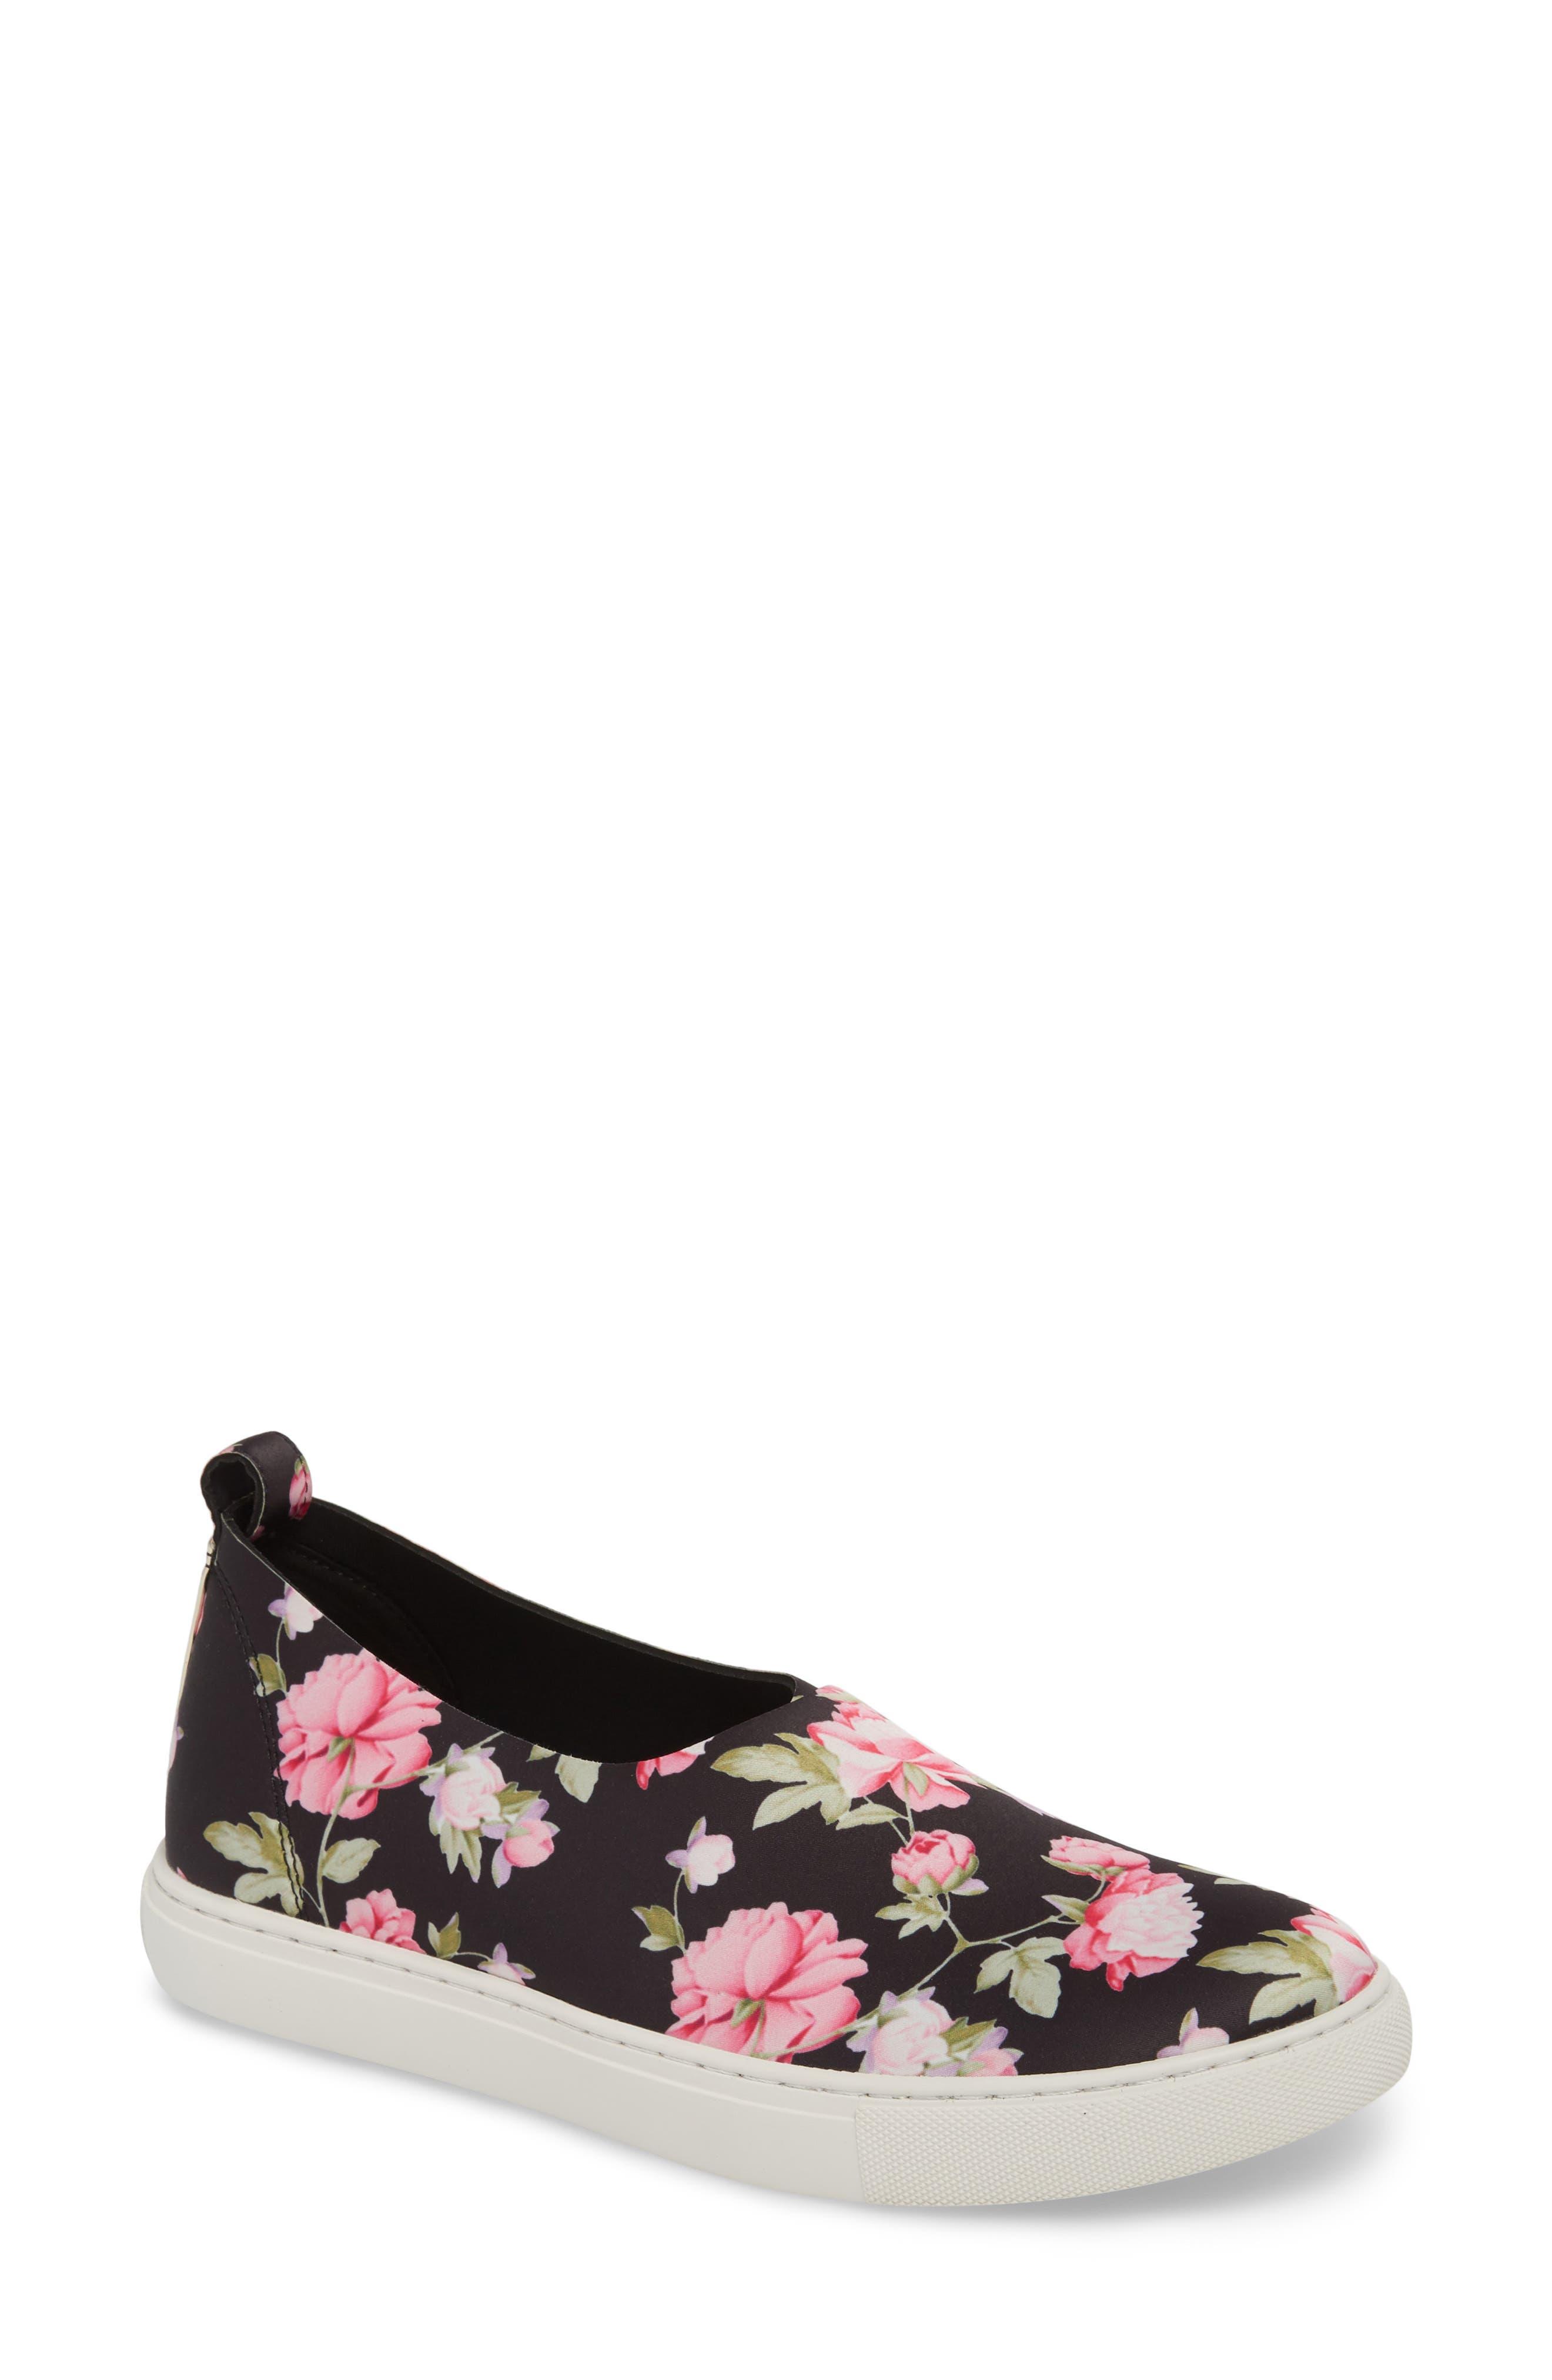 Kathy Slip-On Sneaker,                             Main thumbnail 1, color,                             Pink Multi